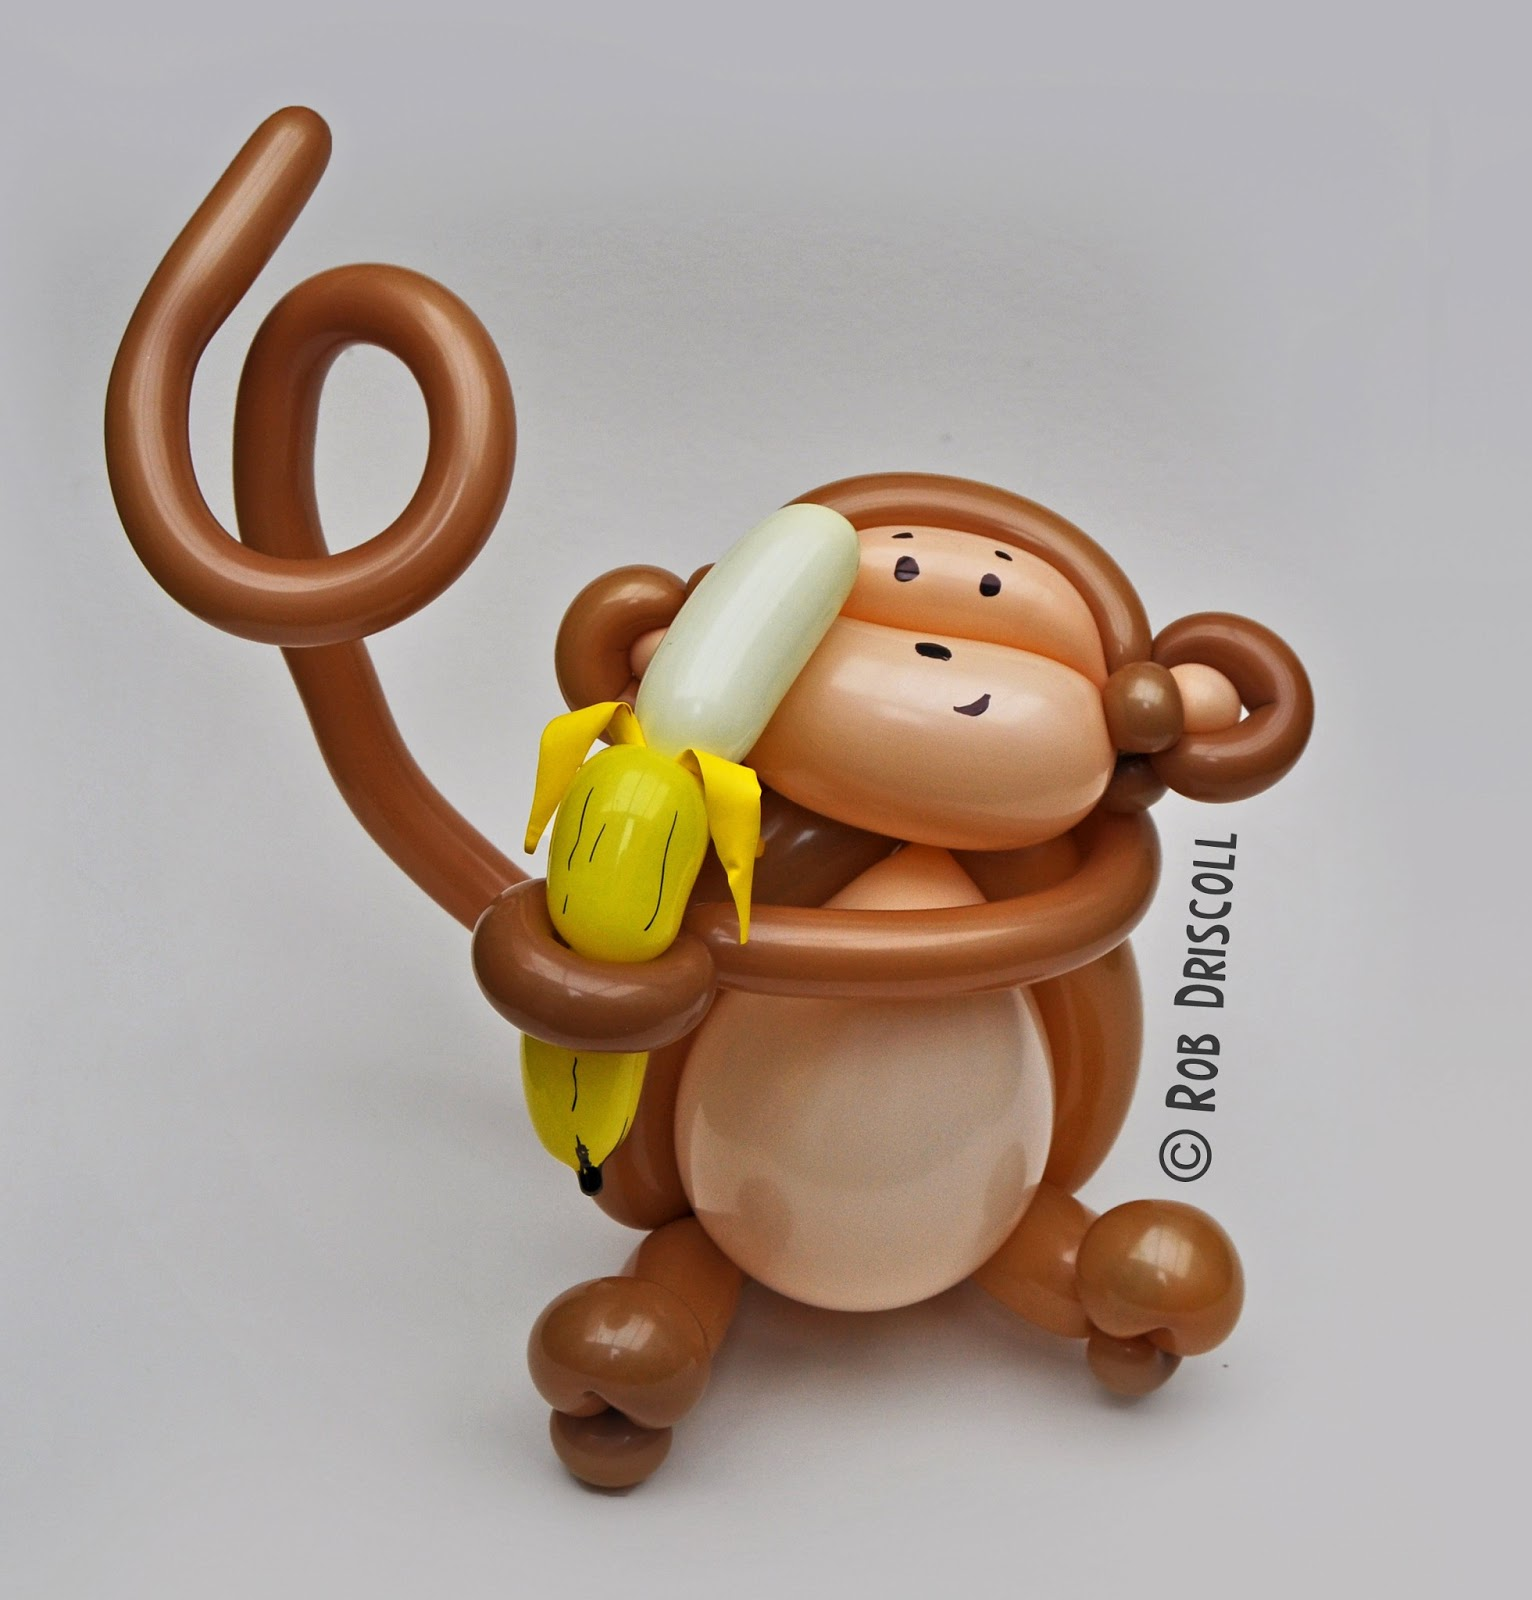 My Daily Balloon: 23rd May - Monkey